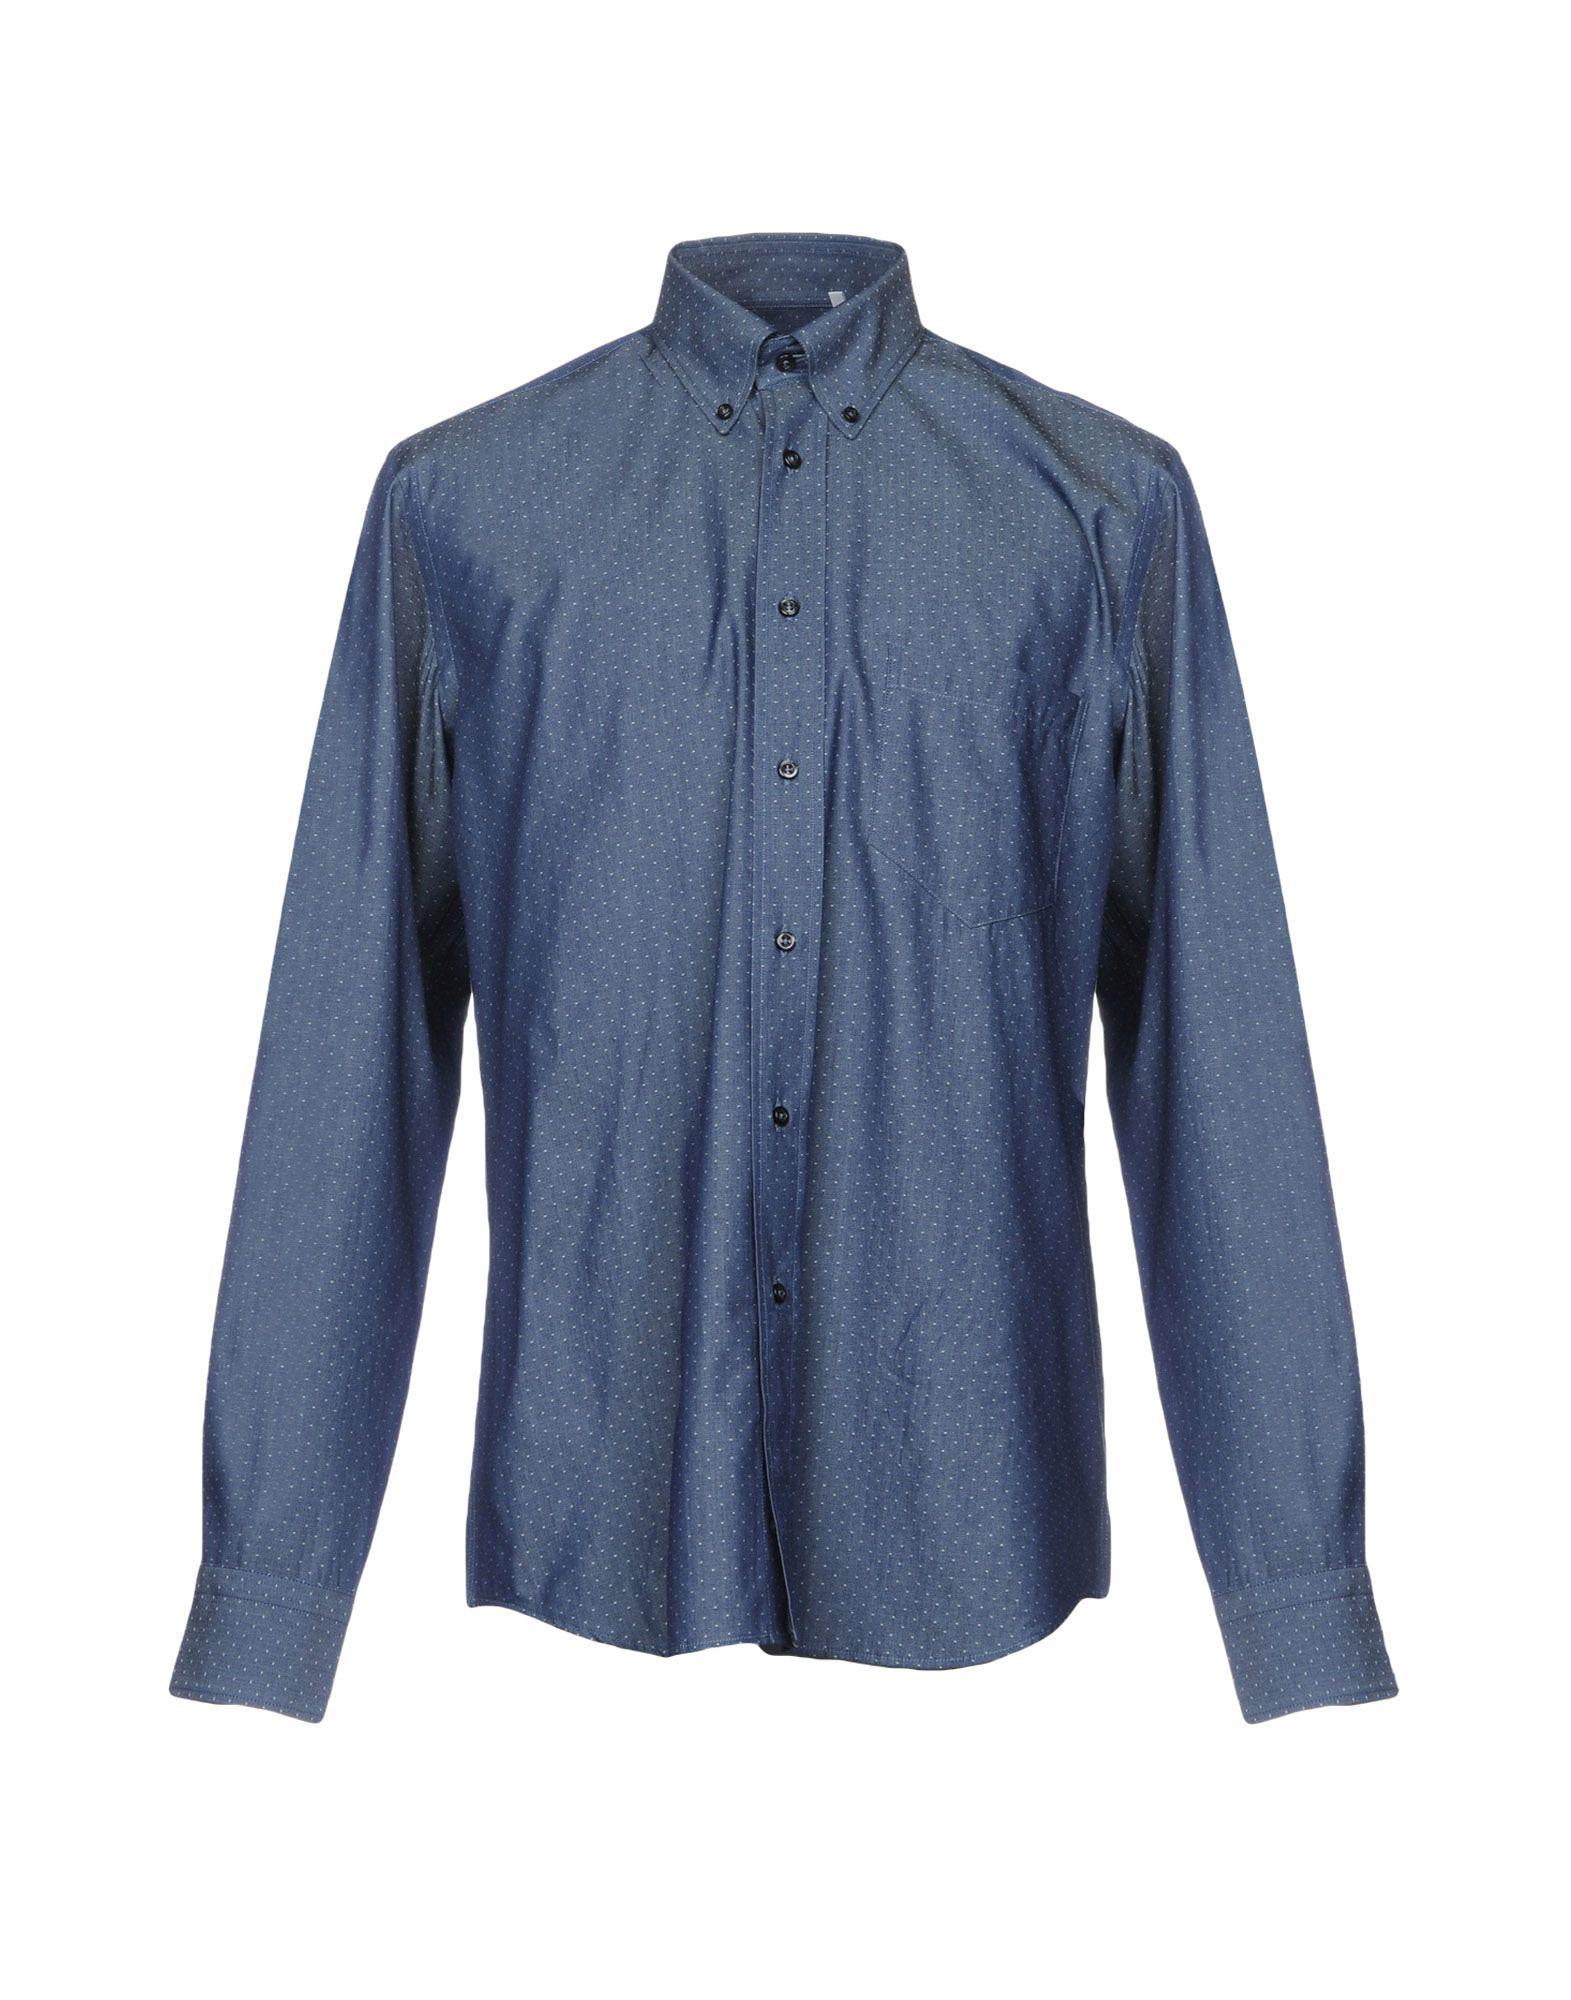 ZANETTI Джинсовая рубашка рубашка в мелкий горошек